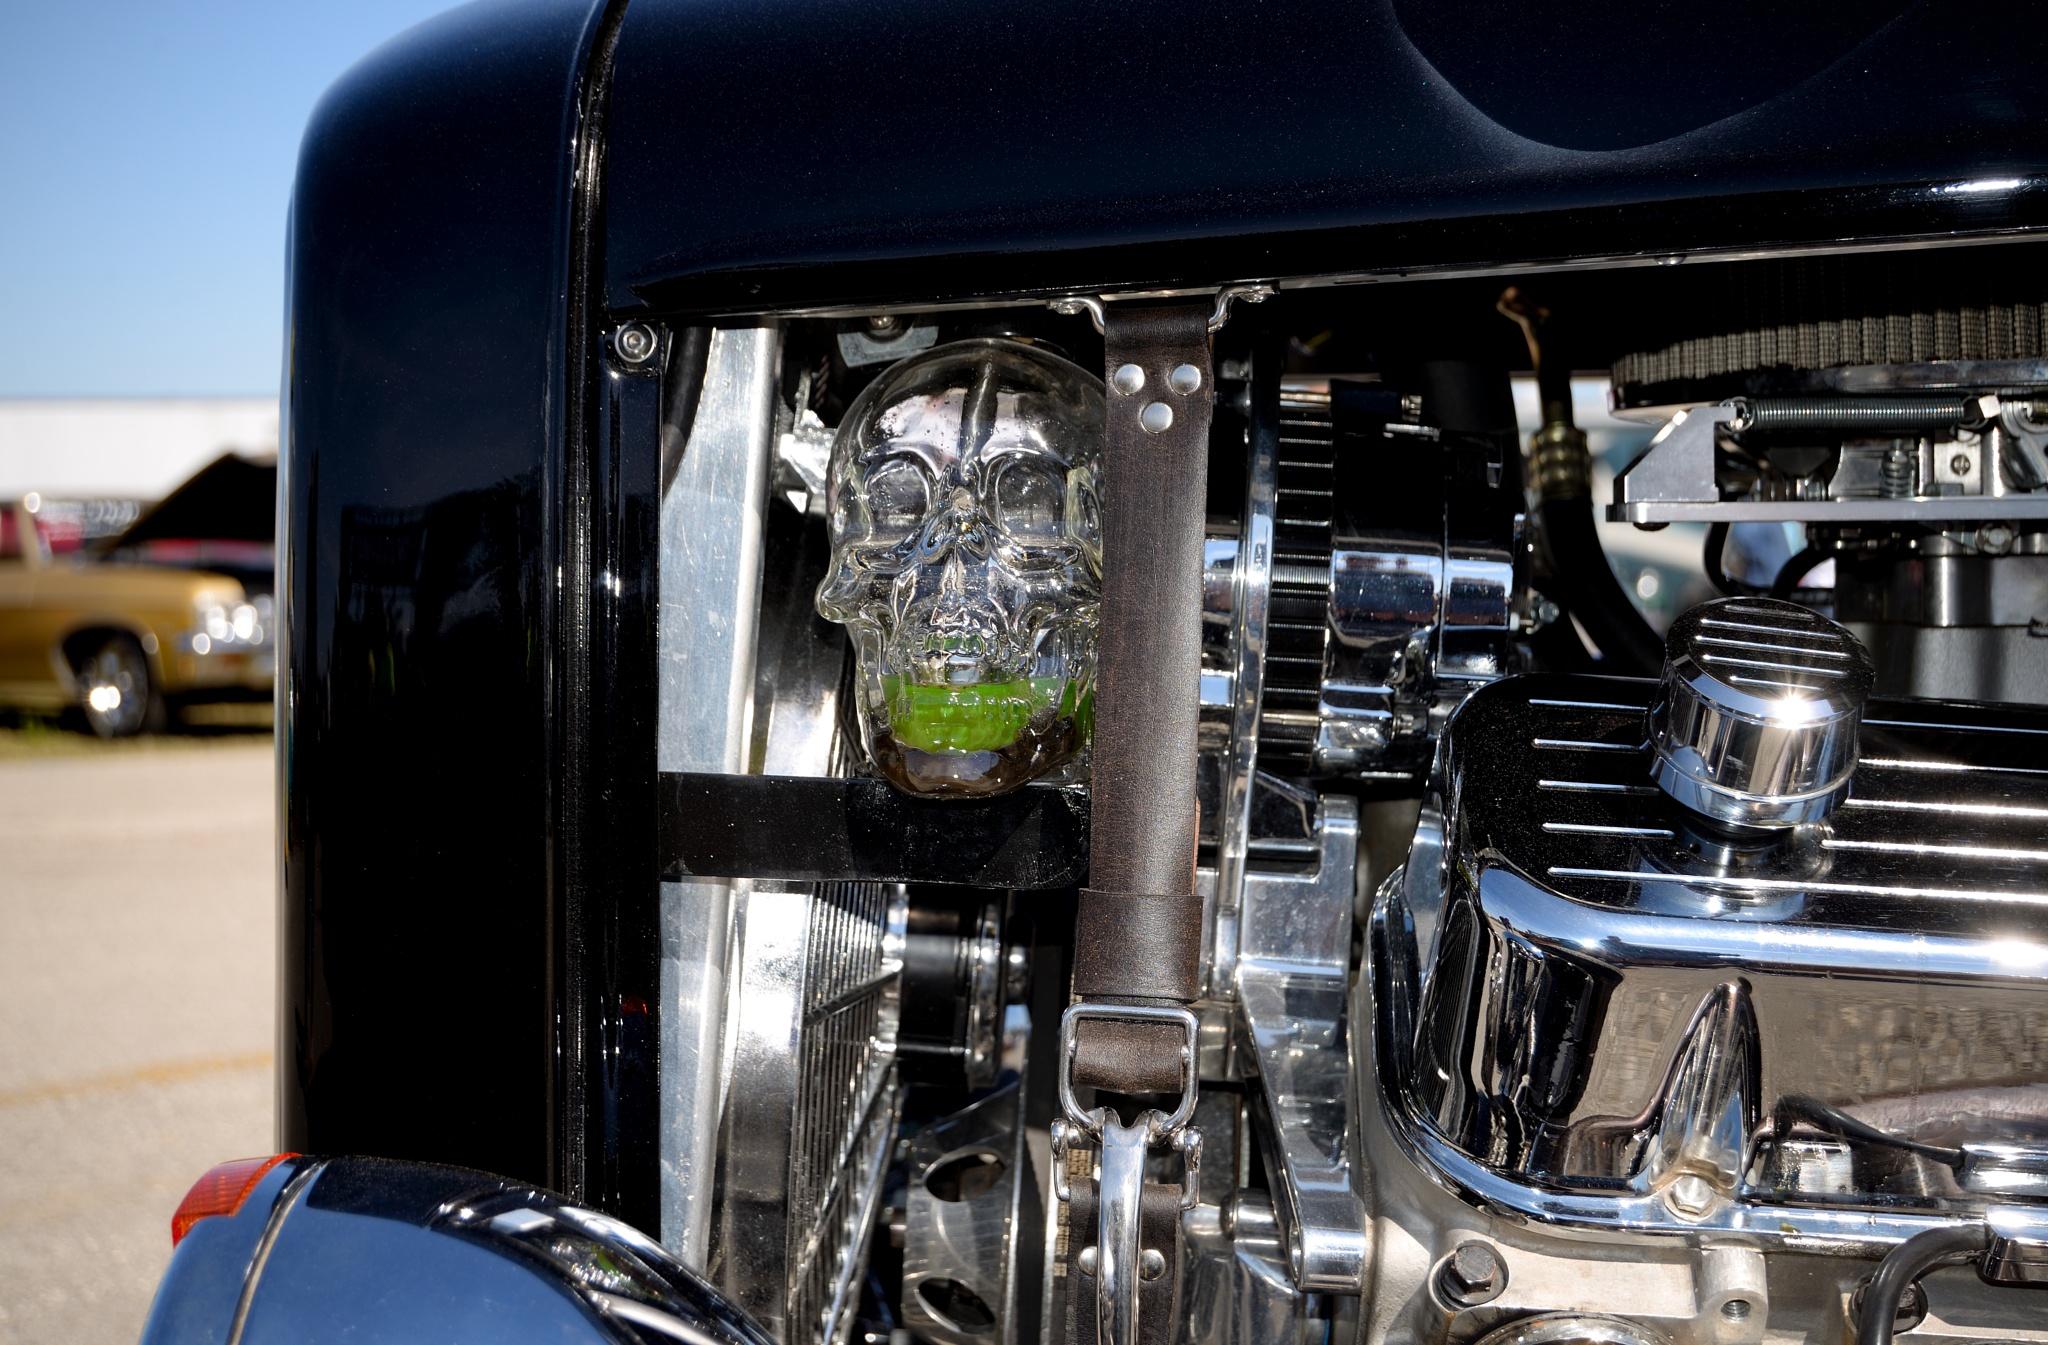 Evil Engine by Joe Bike